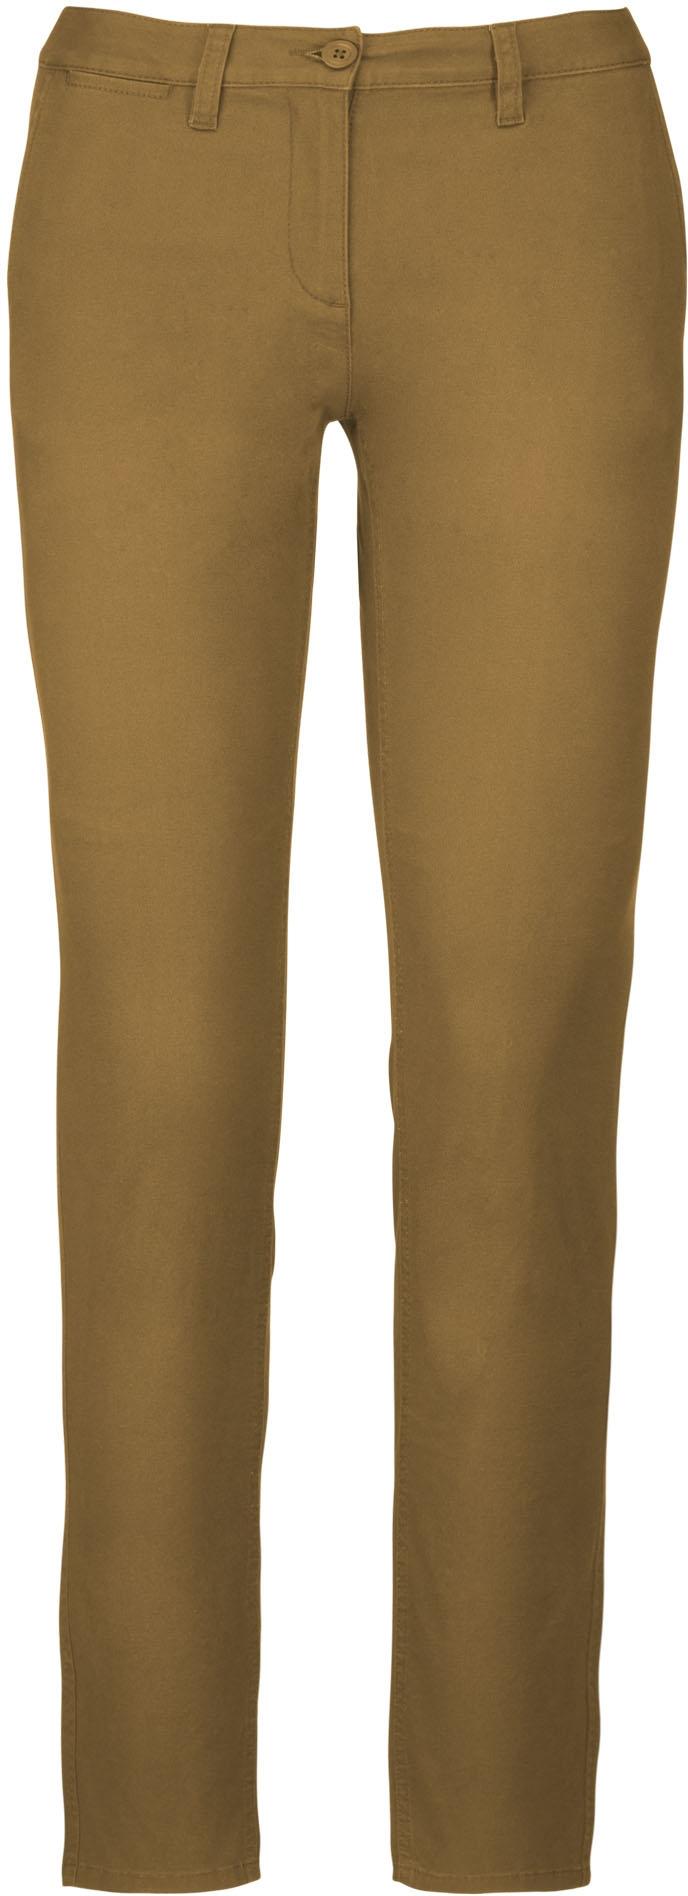 Pantalon chino femme - 2-1479-6